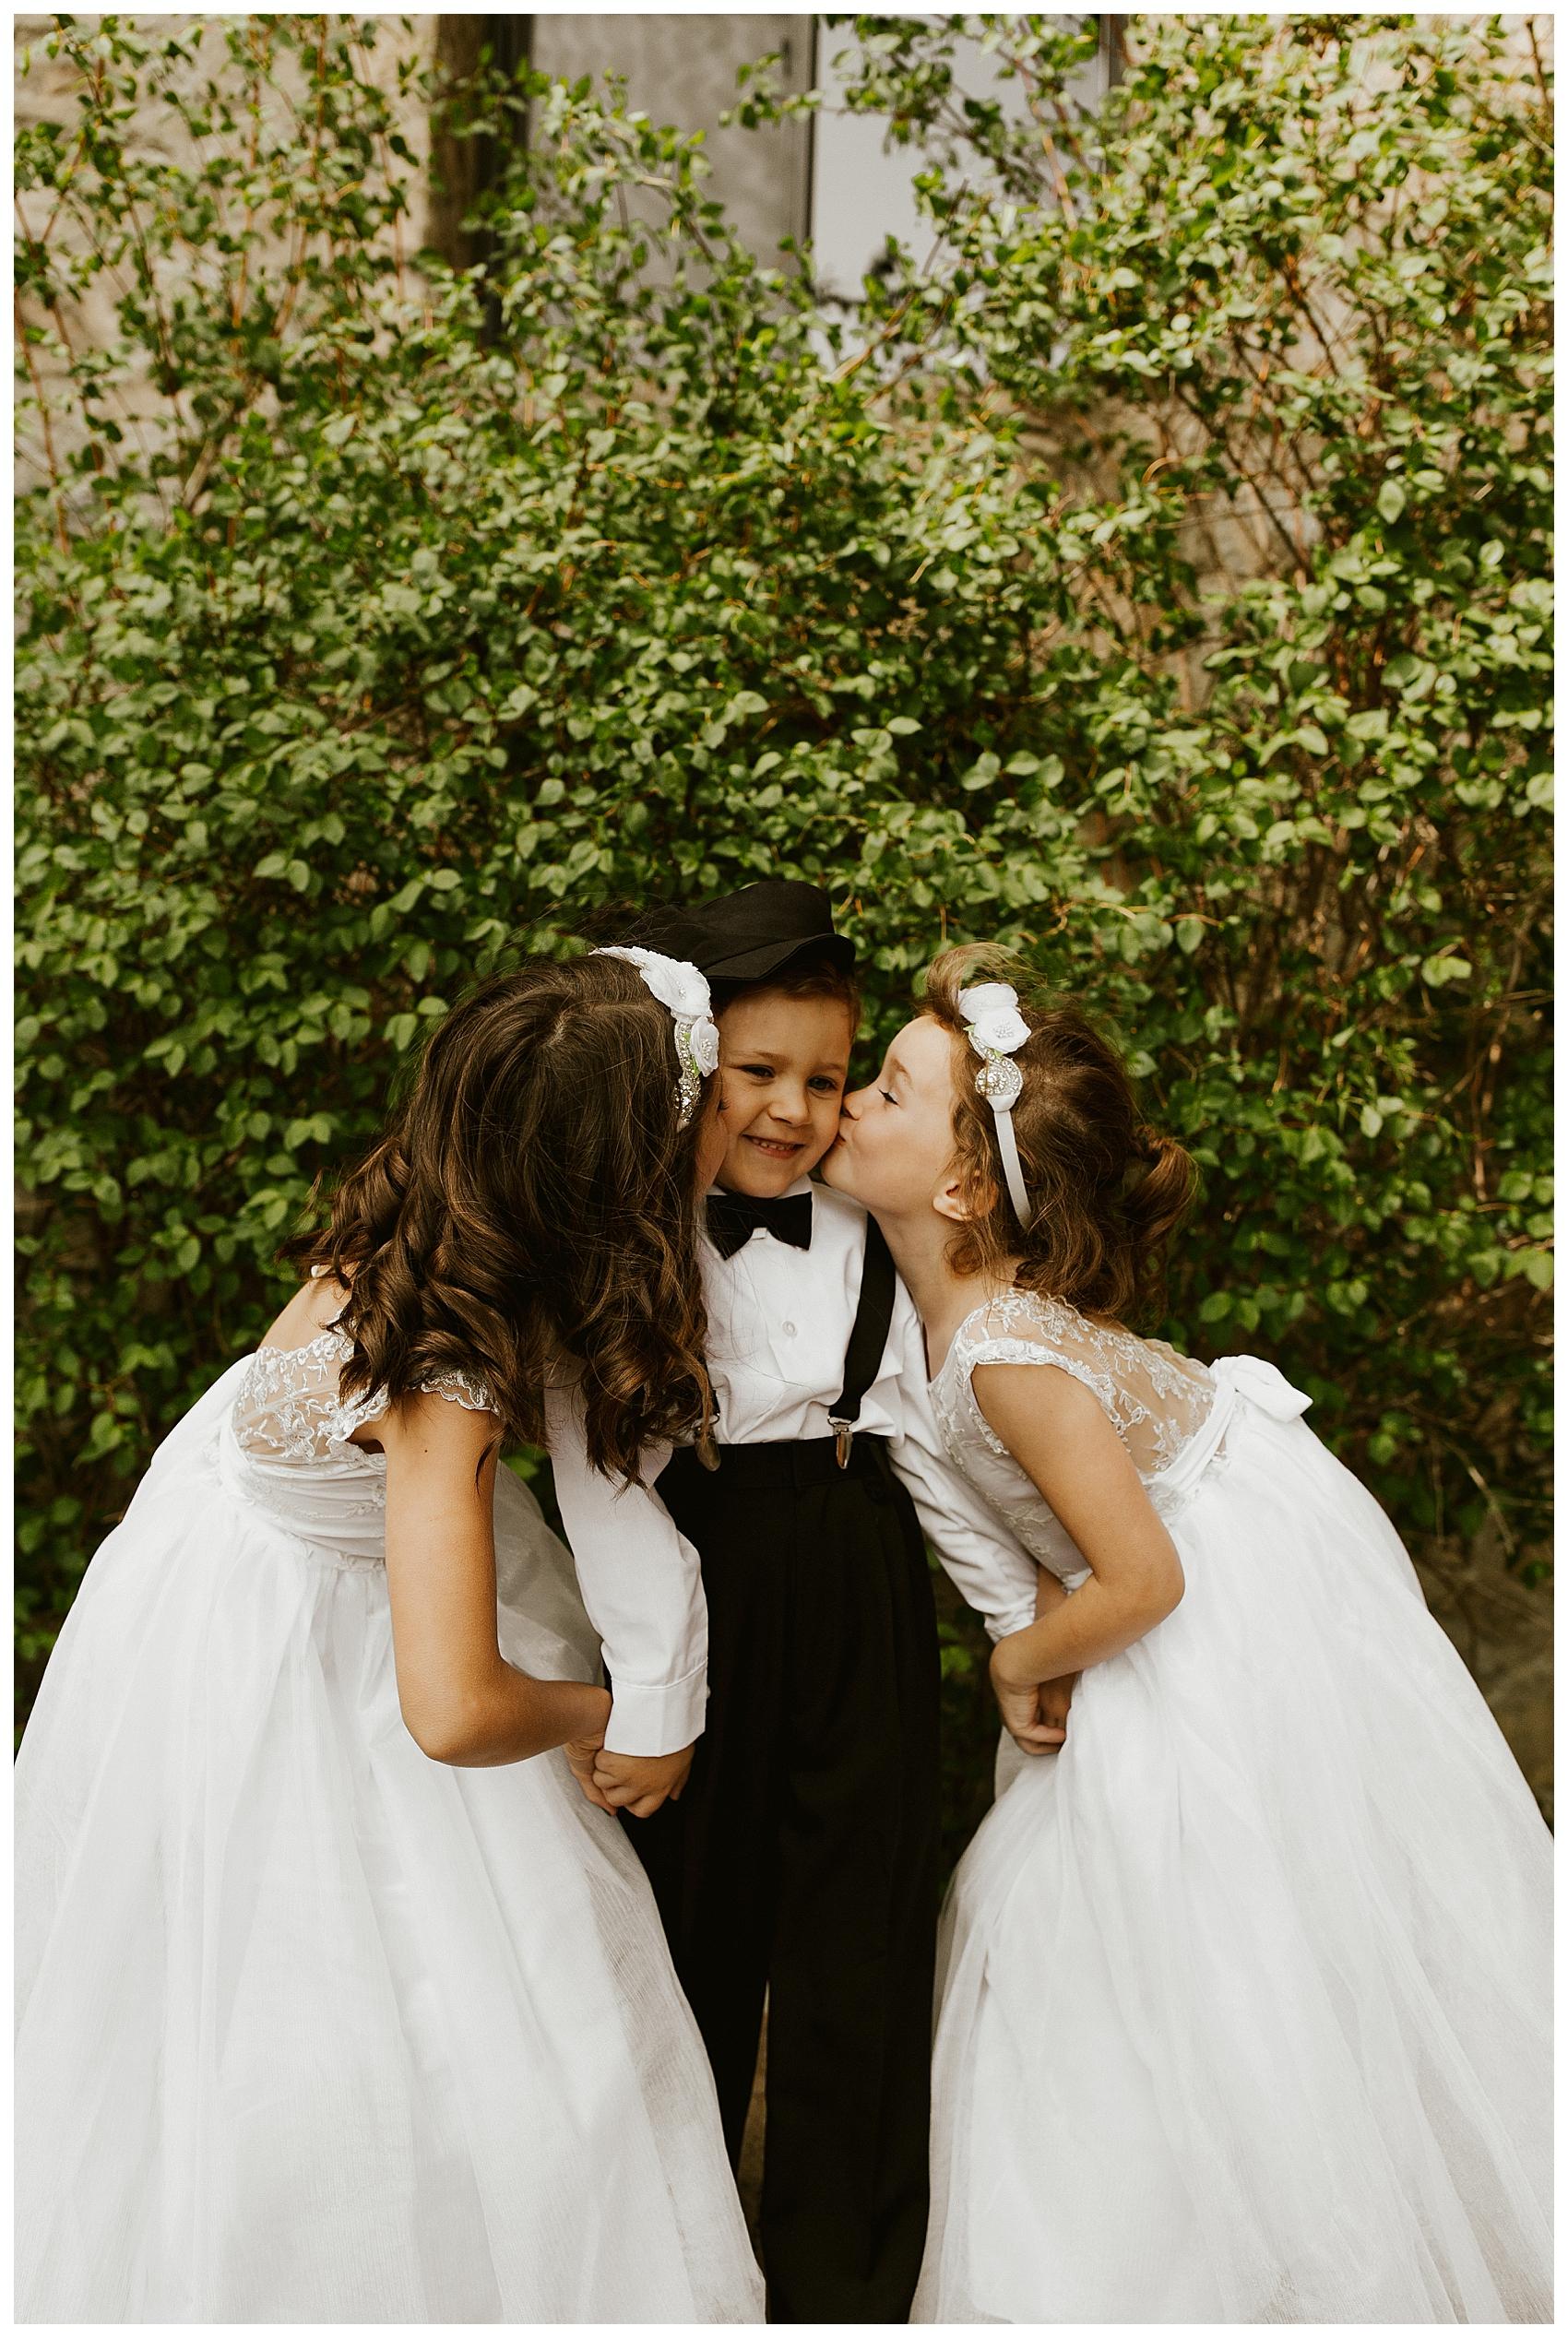 Chateau Rive Spokane Wedding Cassie Trottier Photography01030.jpg